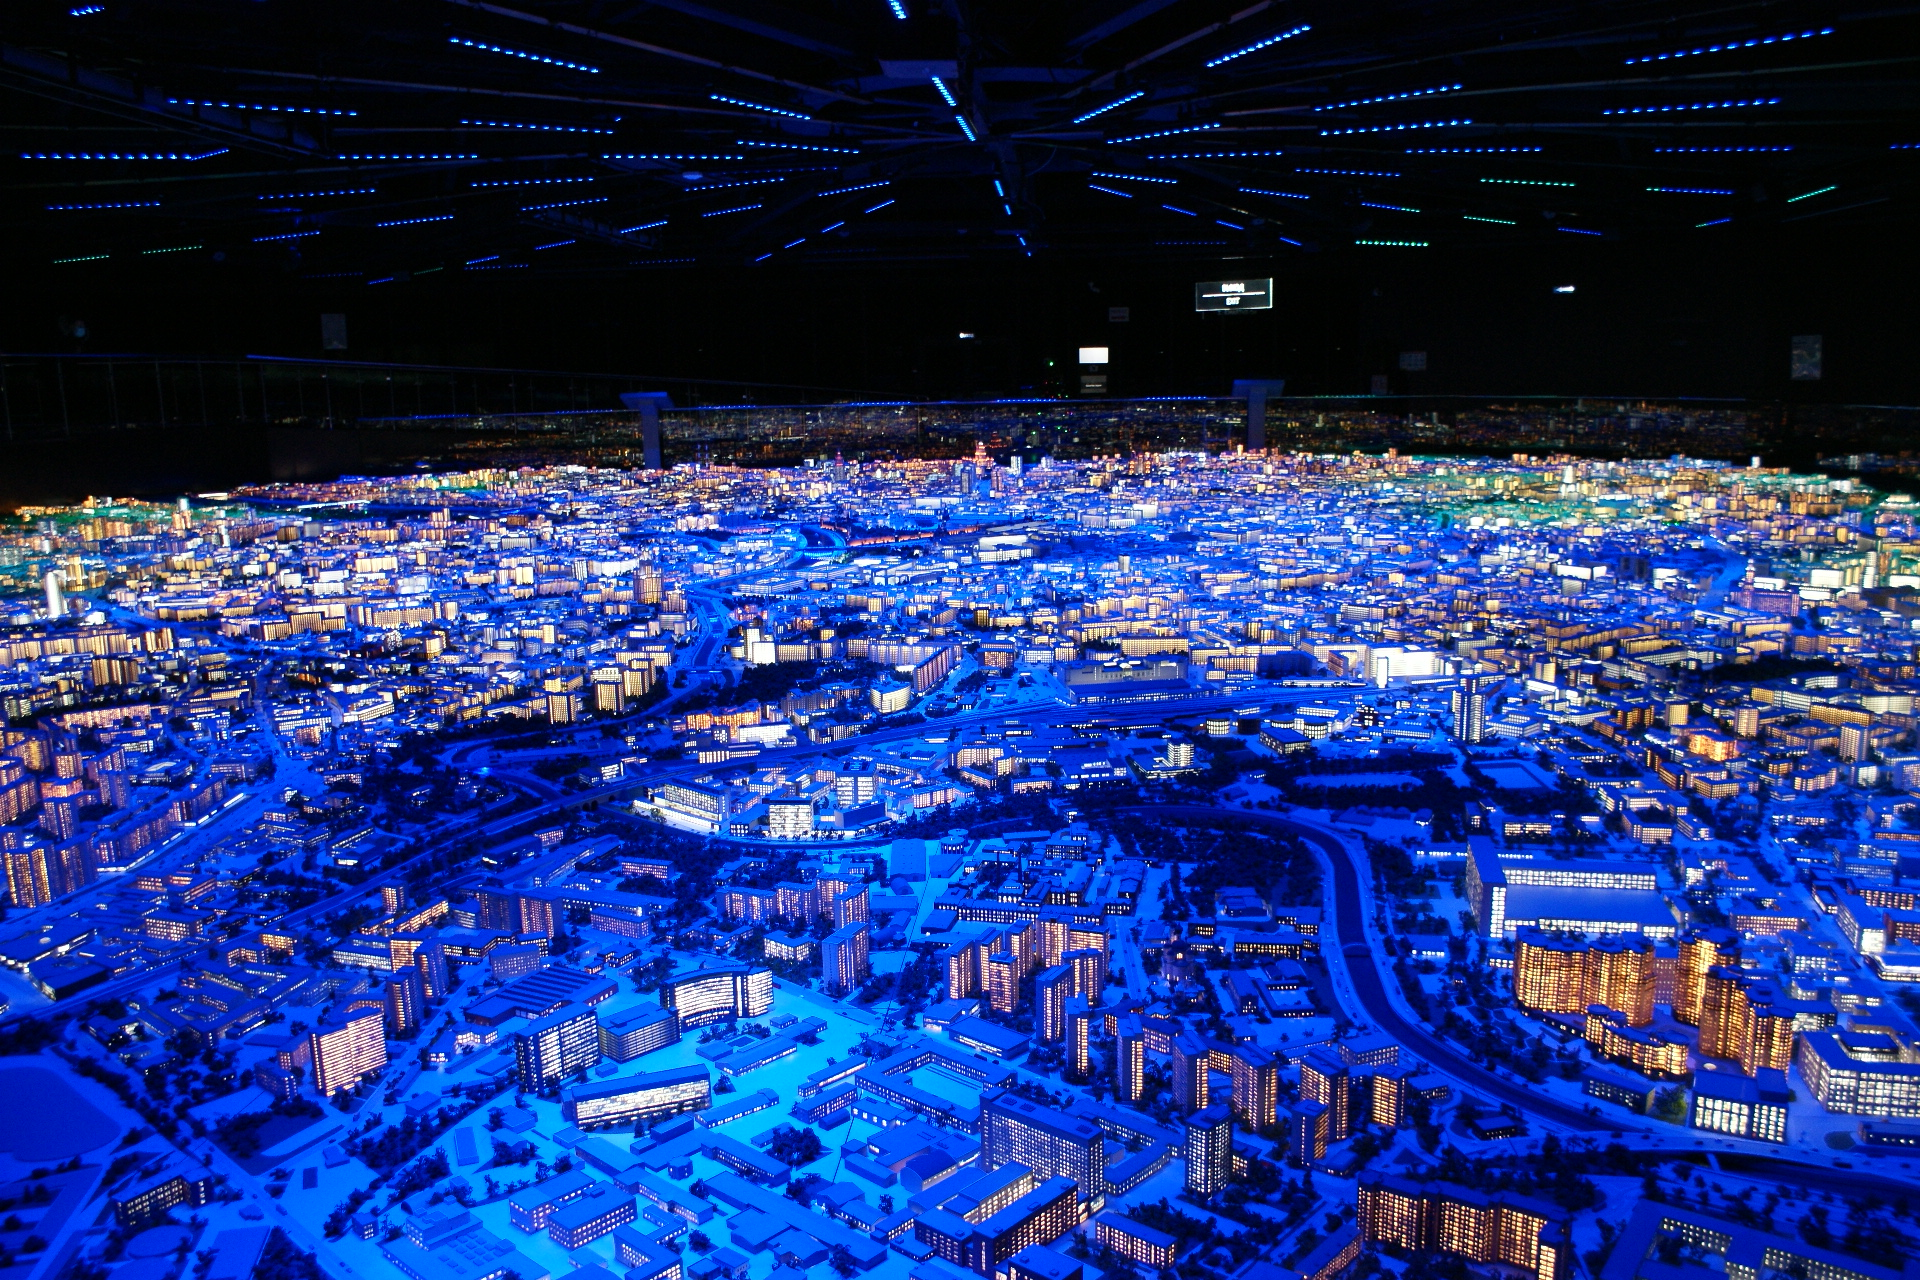 Макет Москвы. Ночная подсветка